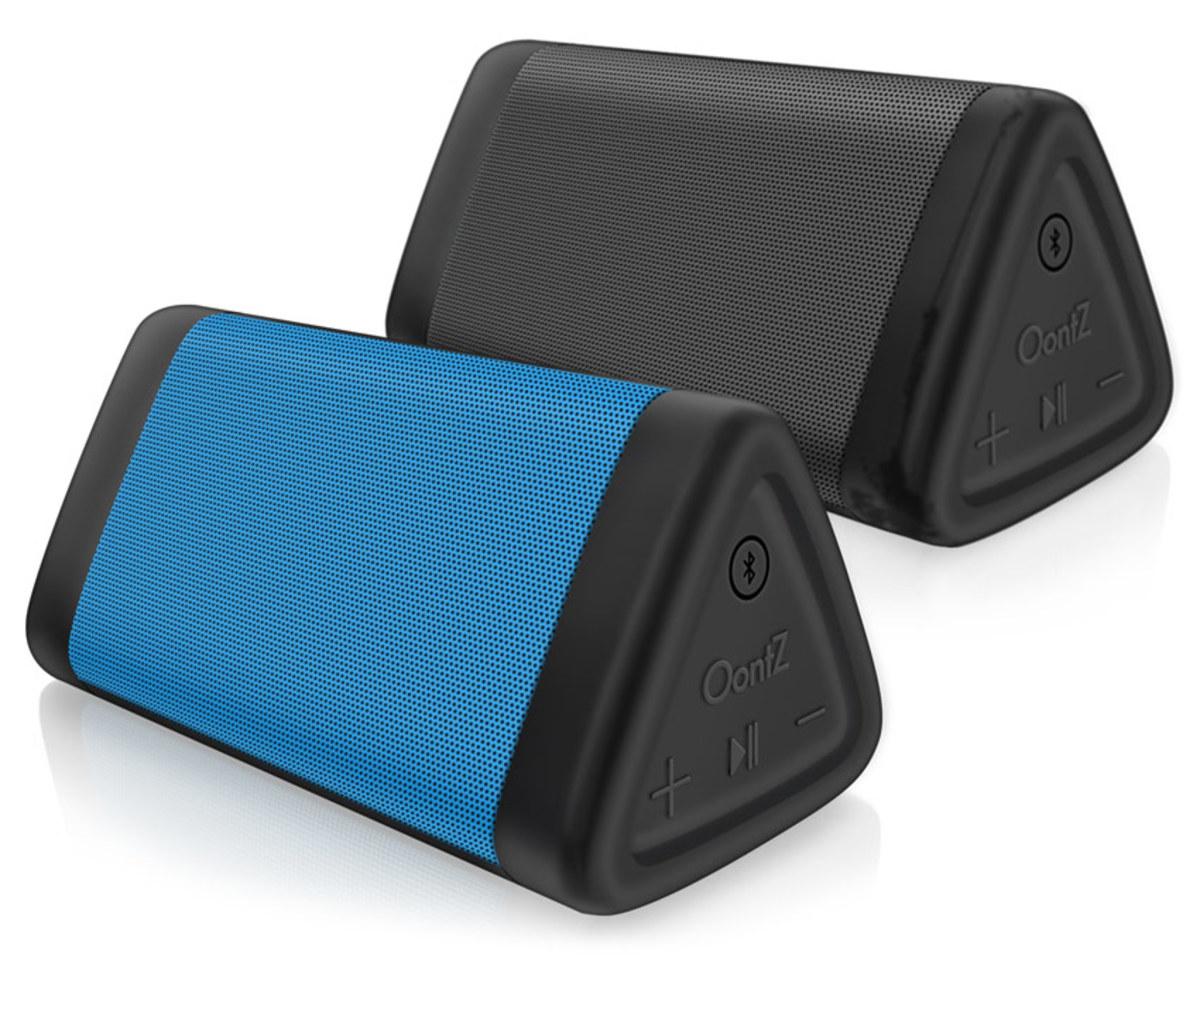 The Oontz Angle 3 speaker is dustproof, sandproof, and rainproof.